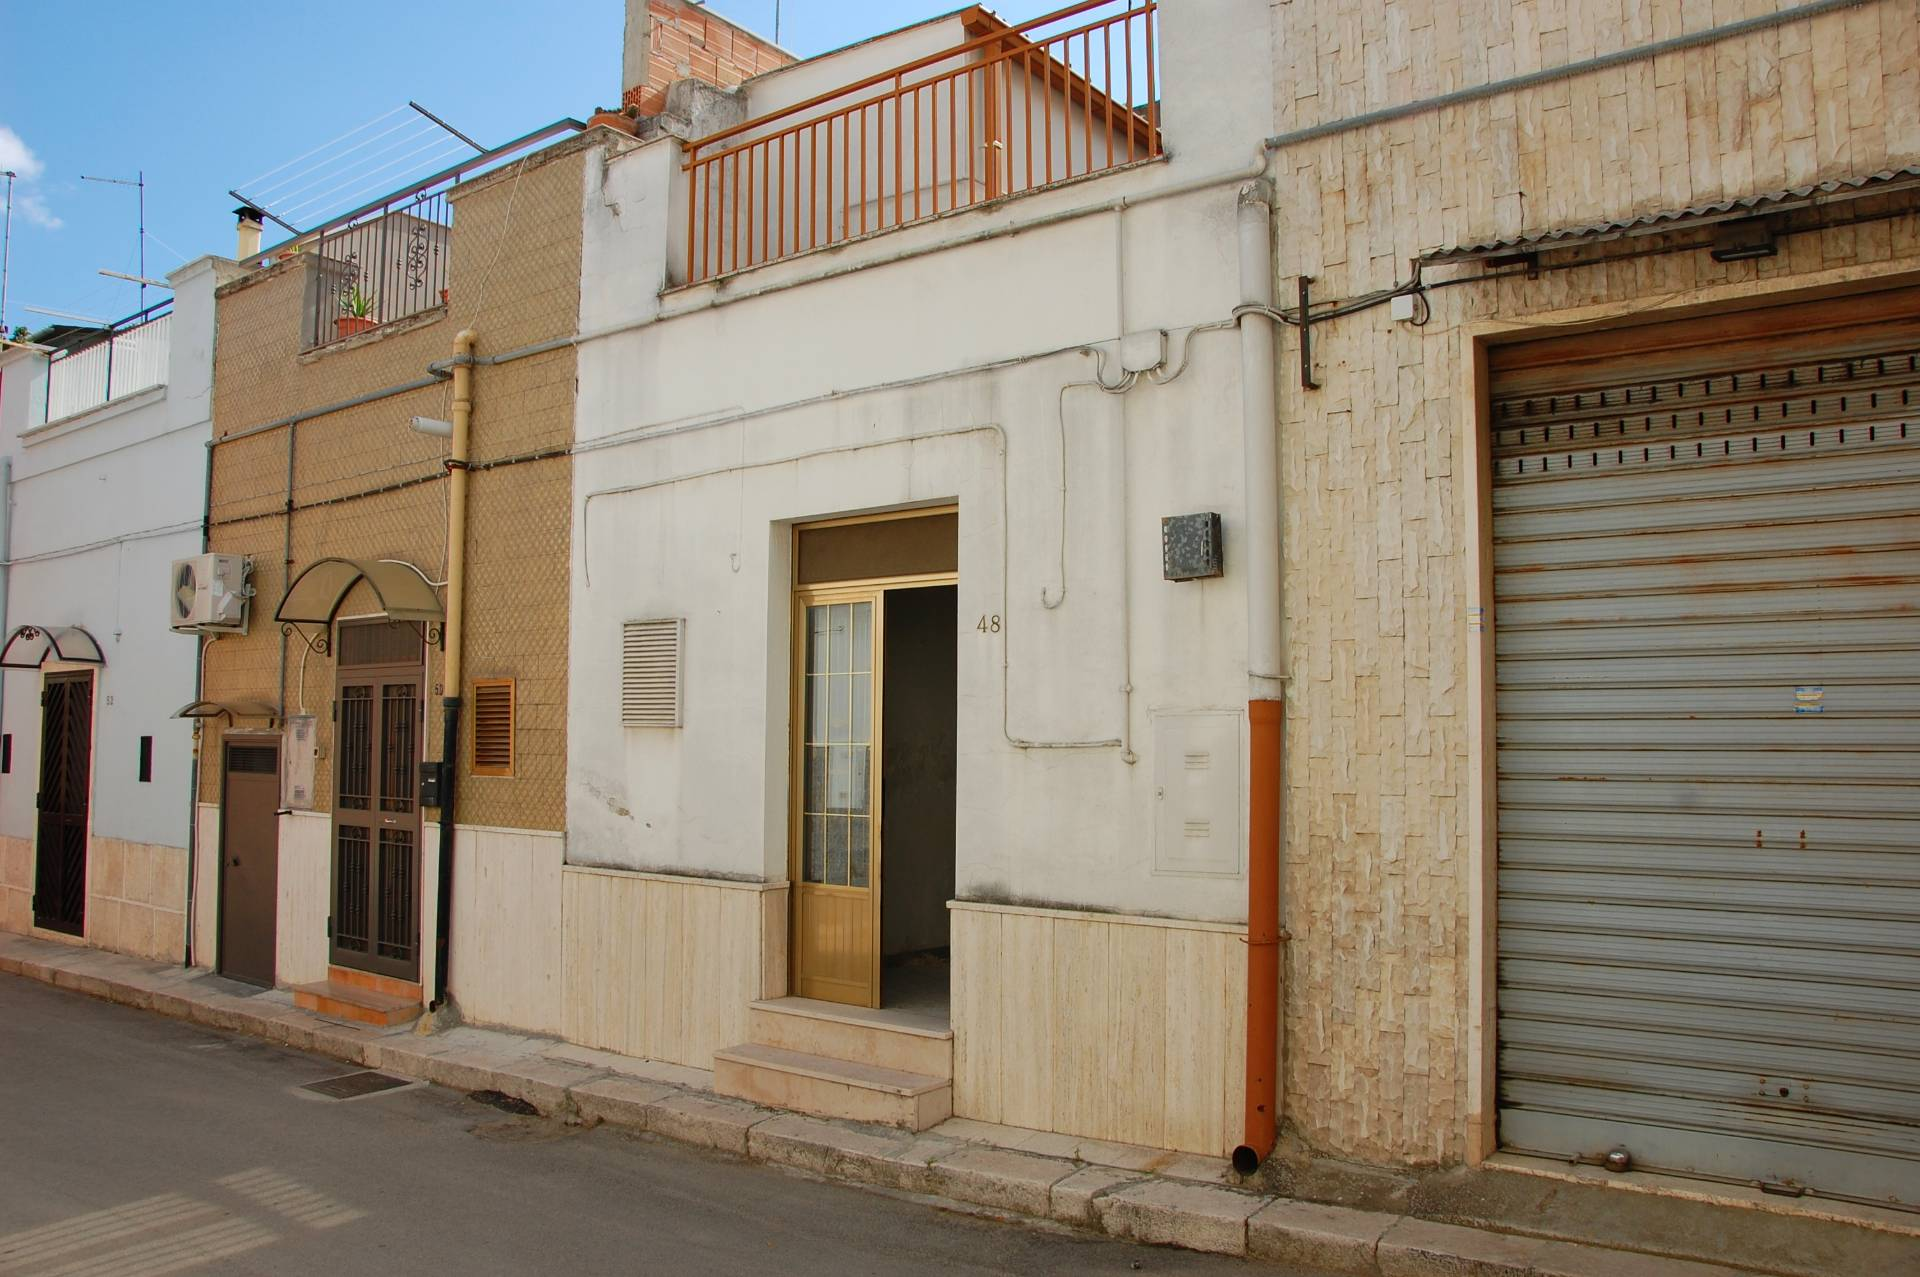 Casa singola in vendita a canosa di puglia cod r267 - Piano casa regione puglia ...